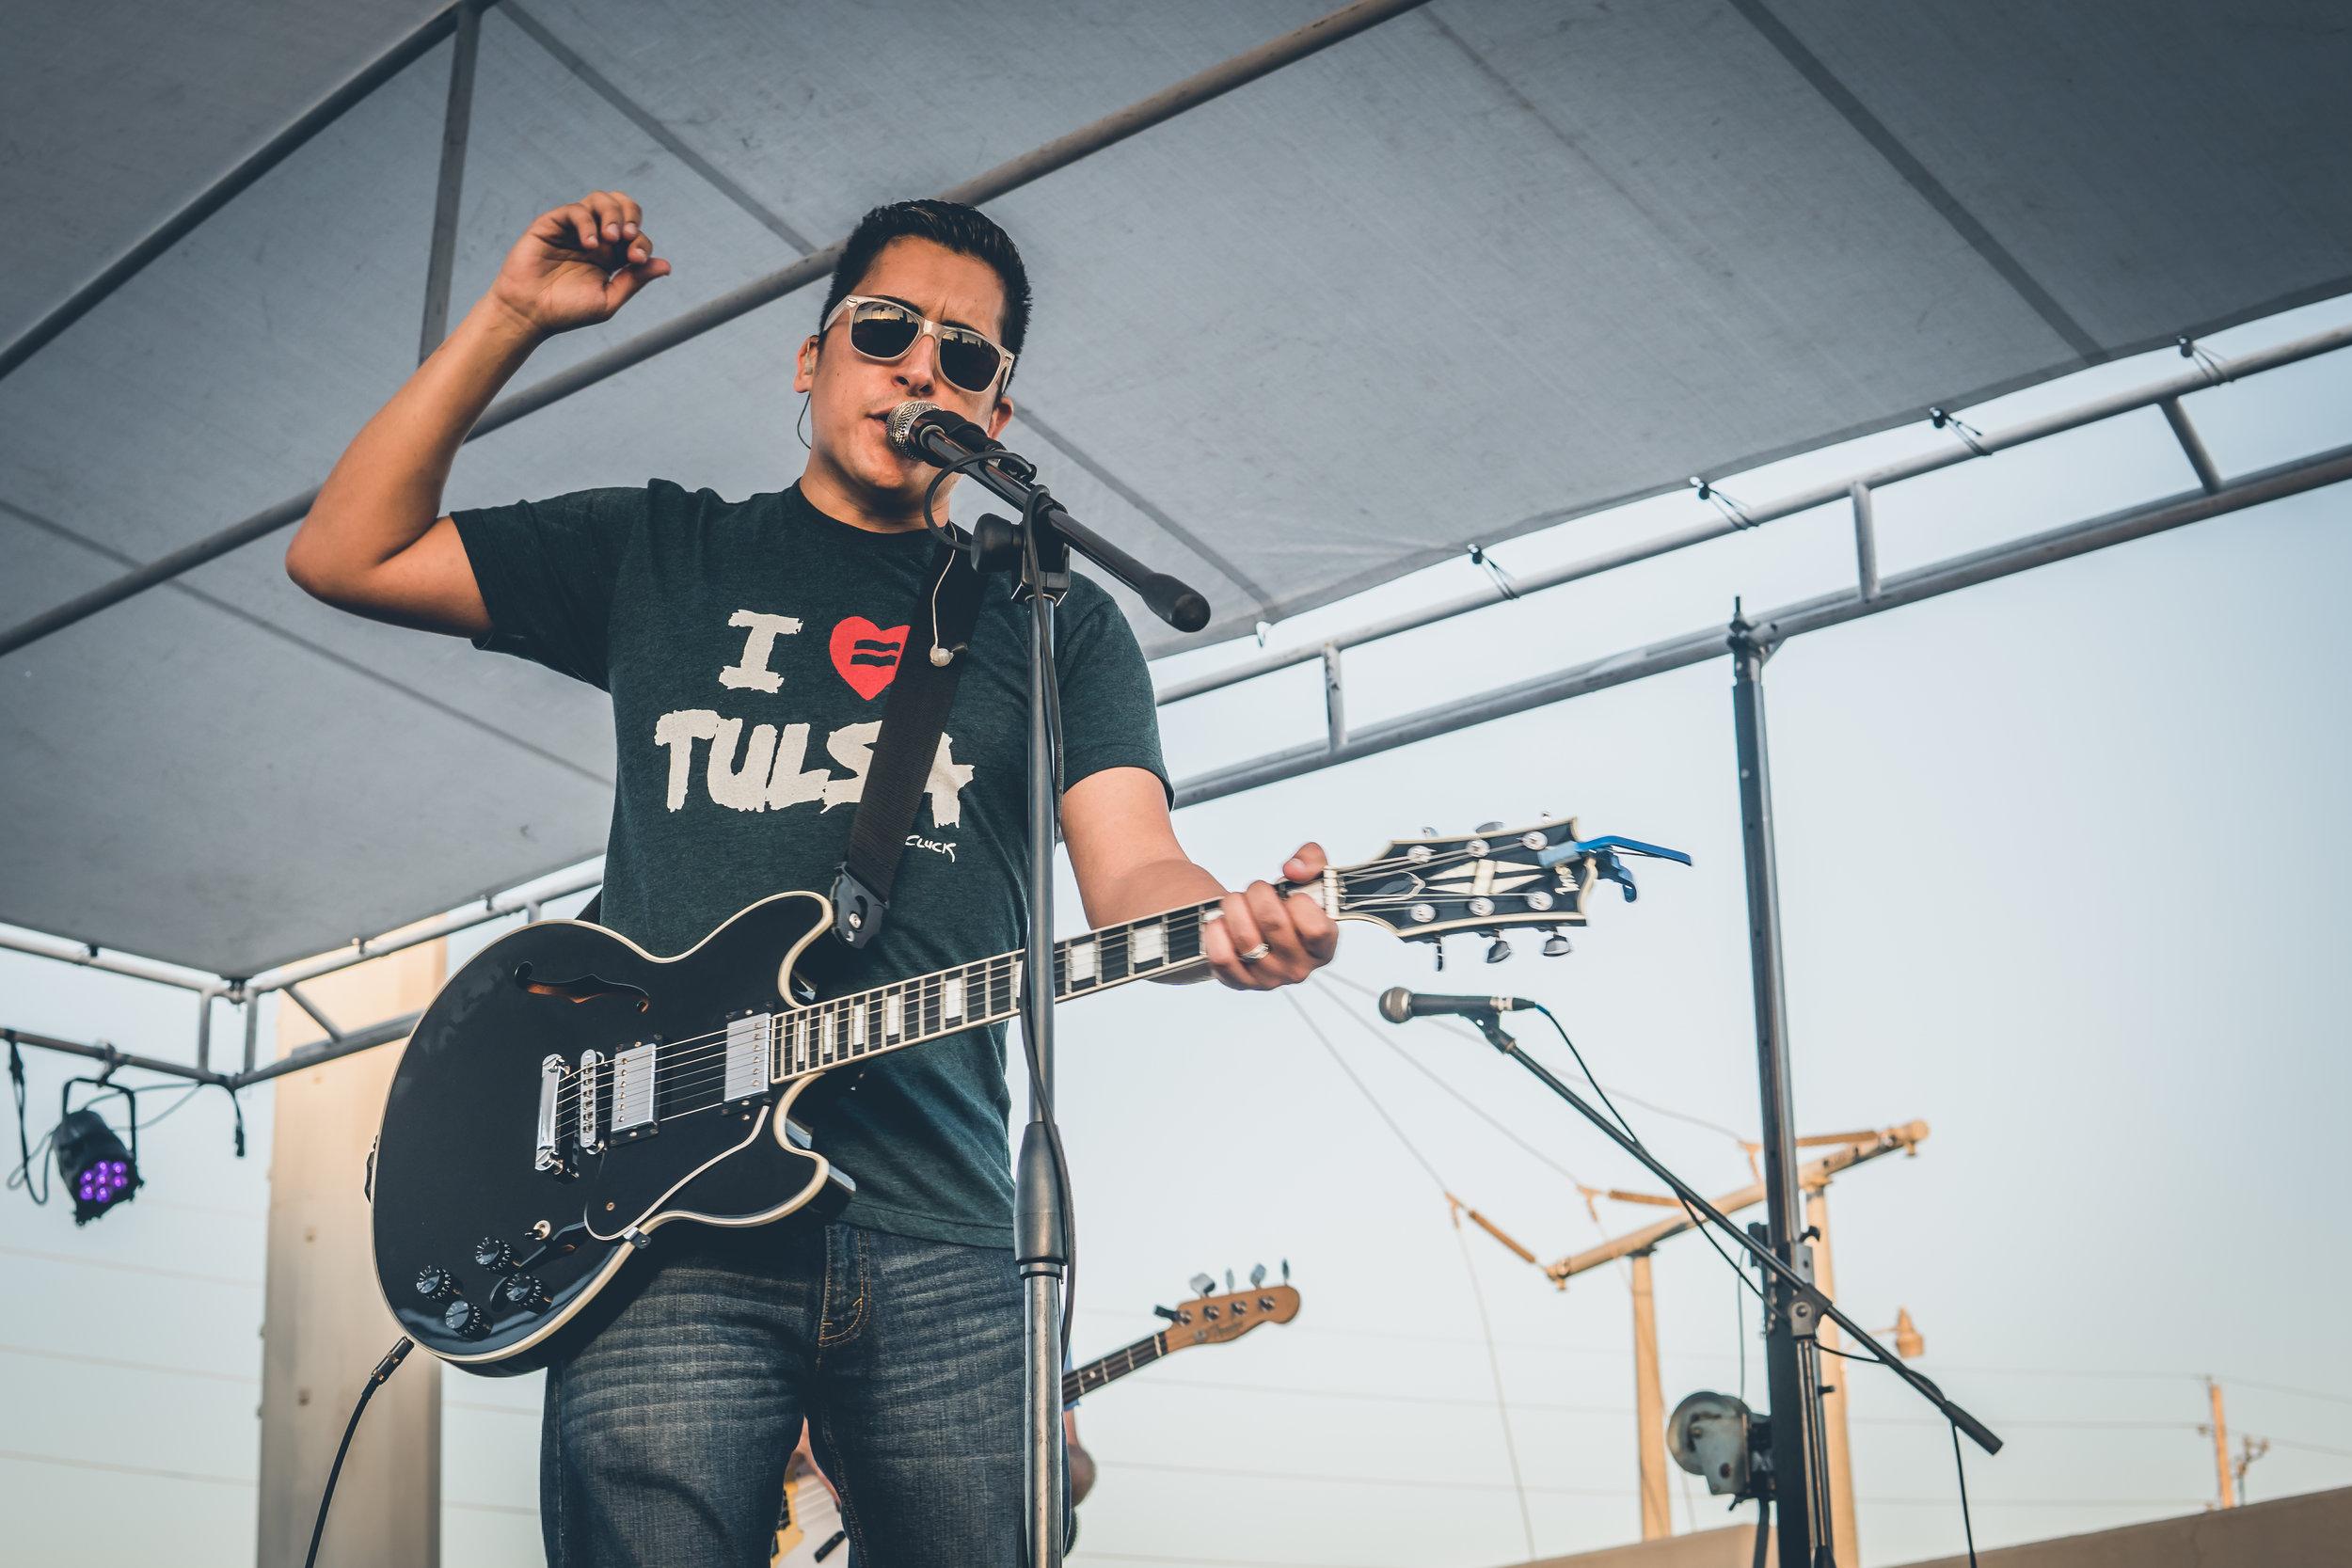 FM Pilots - Tulsa Rock Band - Tulsa Pride Fest Tulsa, OK 060416-7.jpg